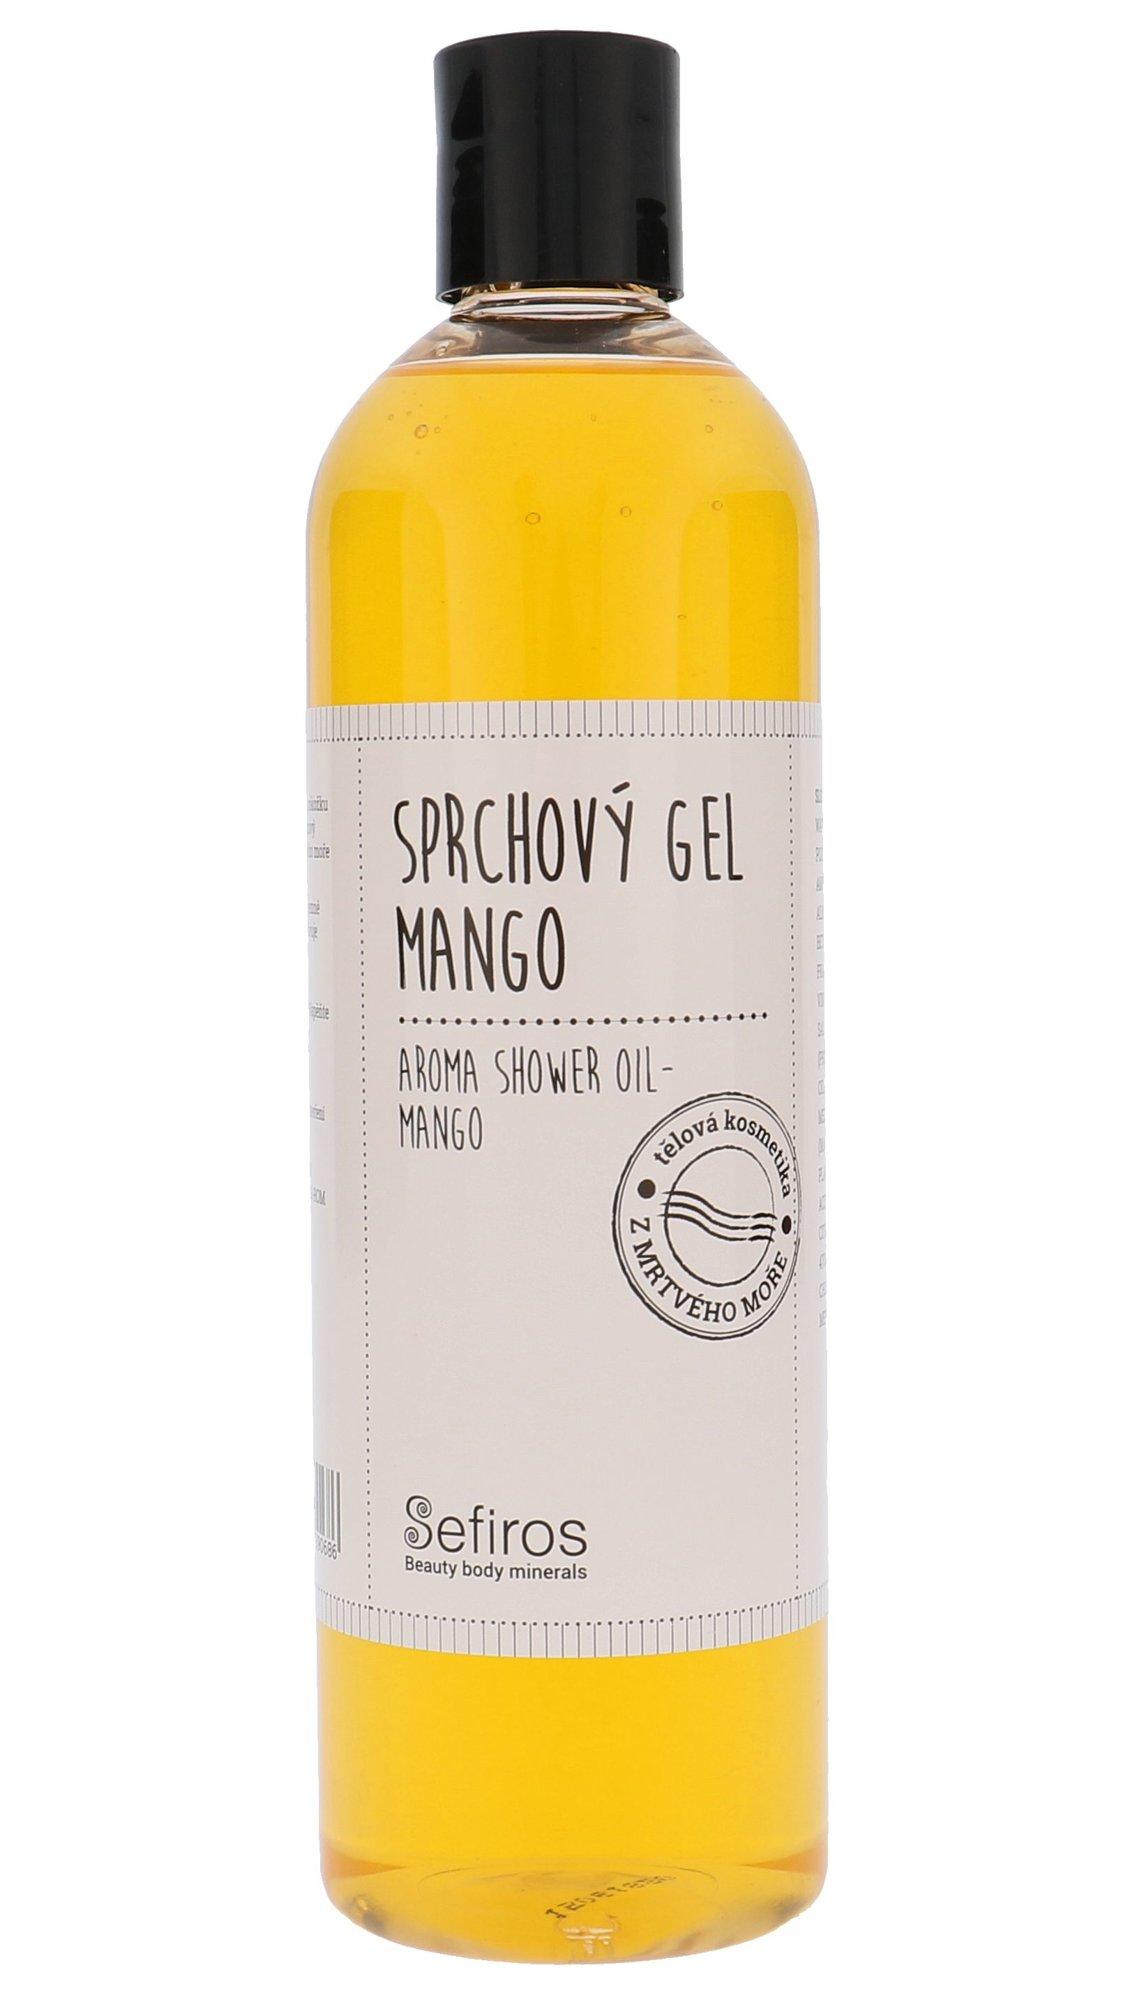 Sefiros Aroma Shower Oil Mango Cosmetic 400ml